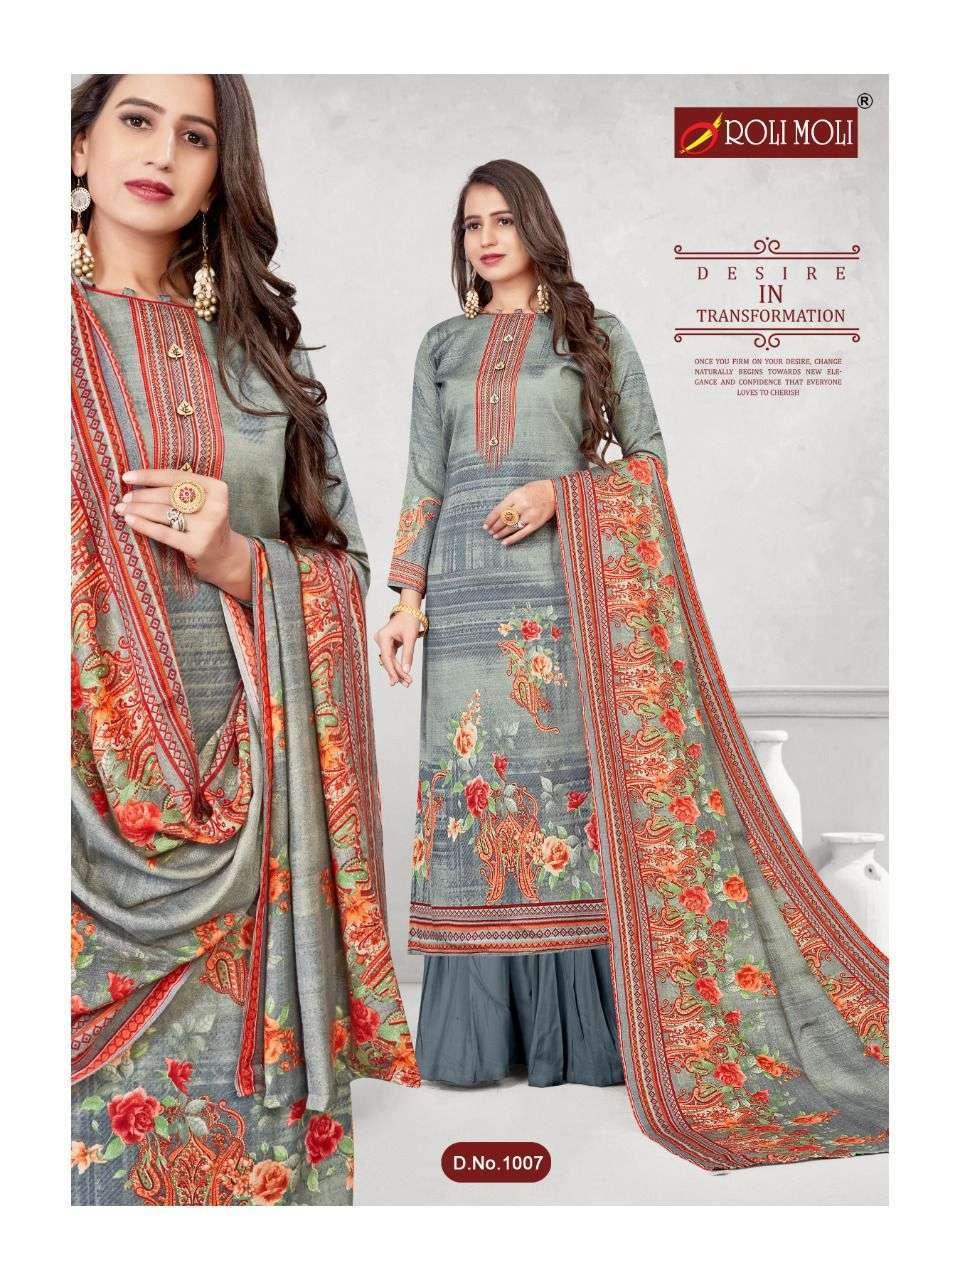 Roli Moli Kalki Pashmina Printed Dress Material Collection 03